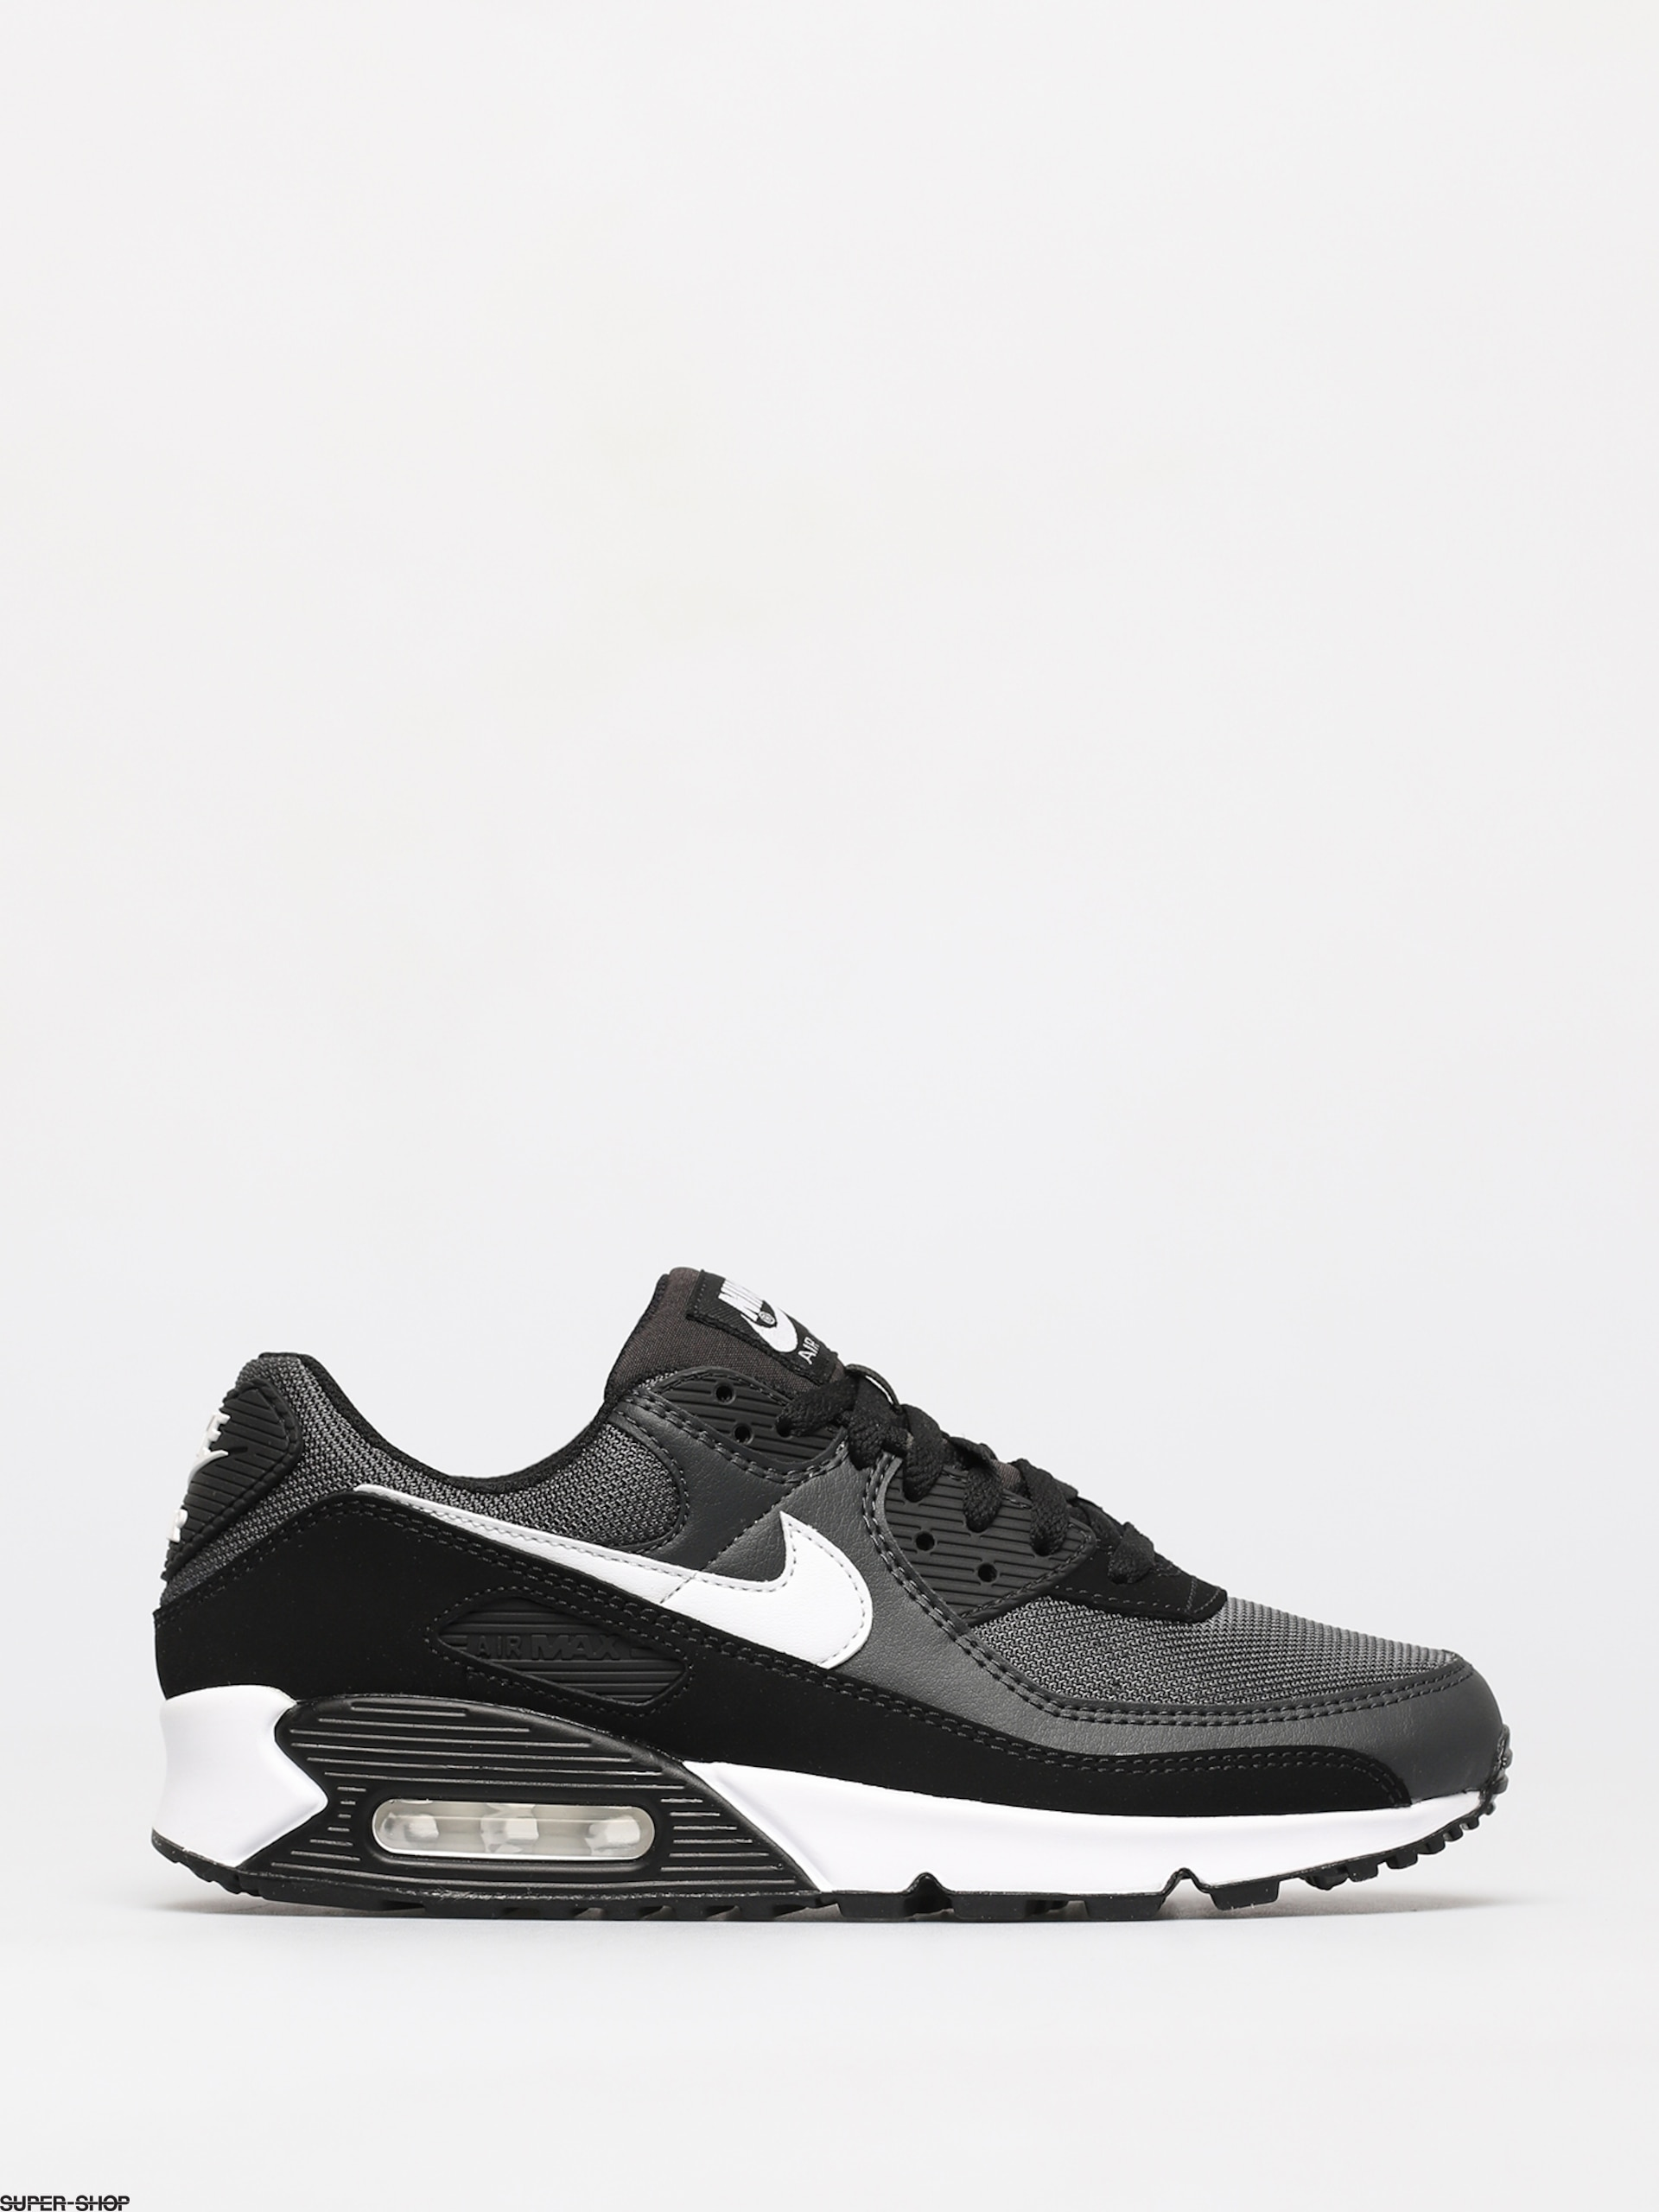 Nike Air Max 90 Shoes (iron grey/white